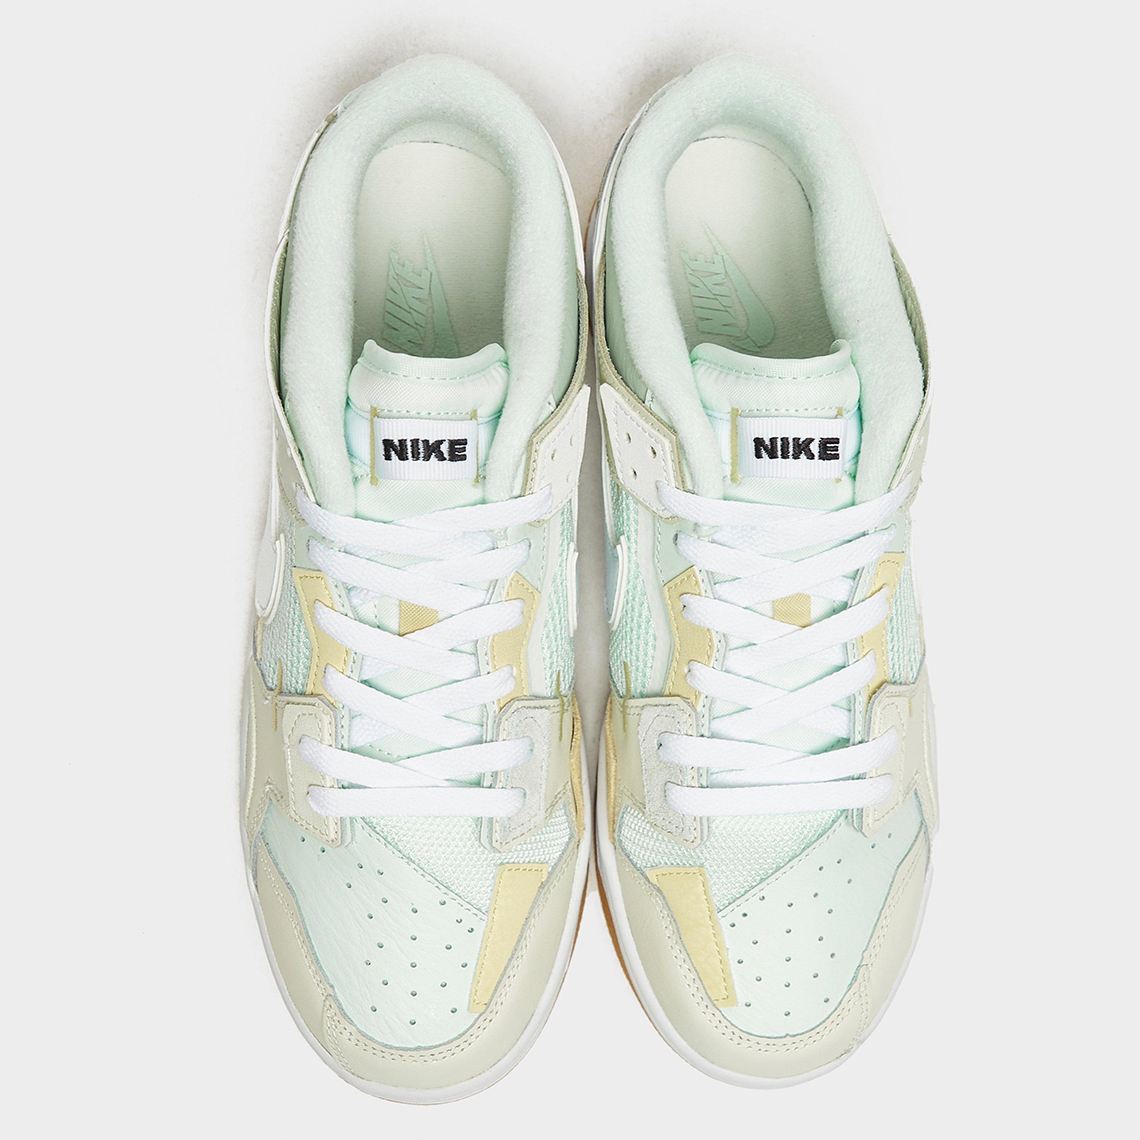 Nike-Dunk-Low-Scrap-DB0500-100-4.jpg?w=1140